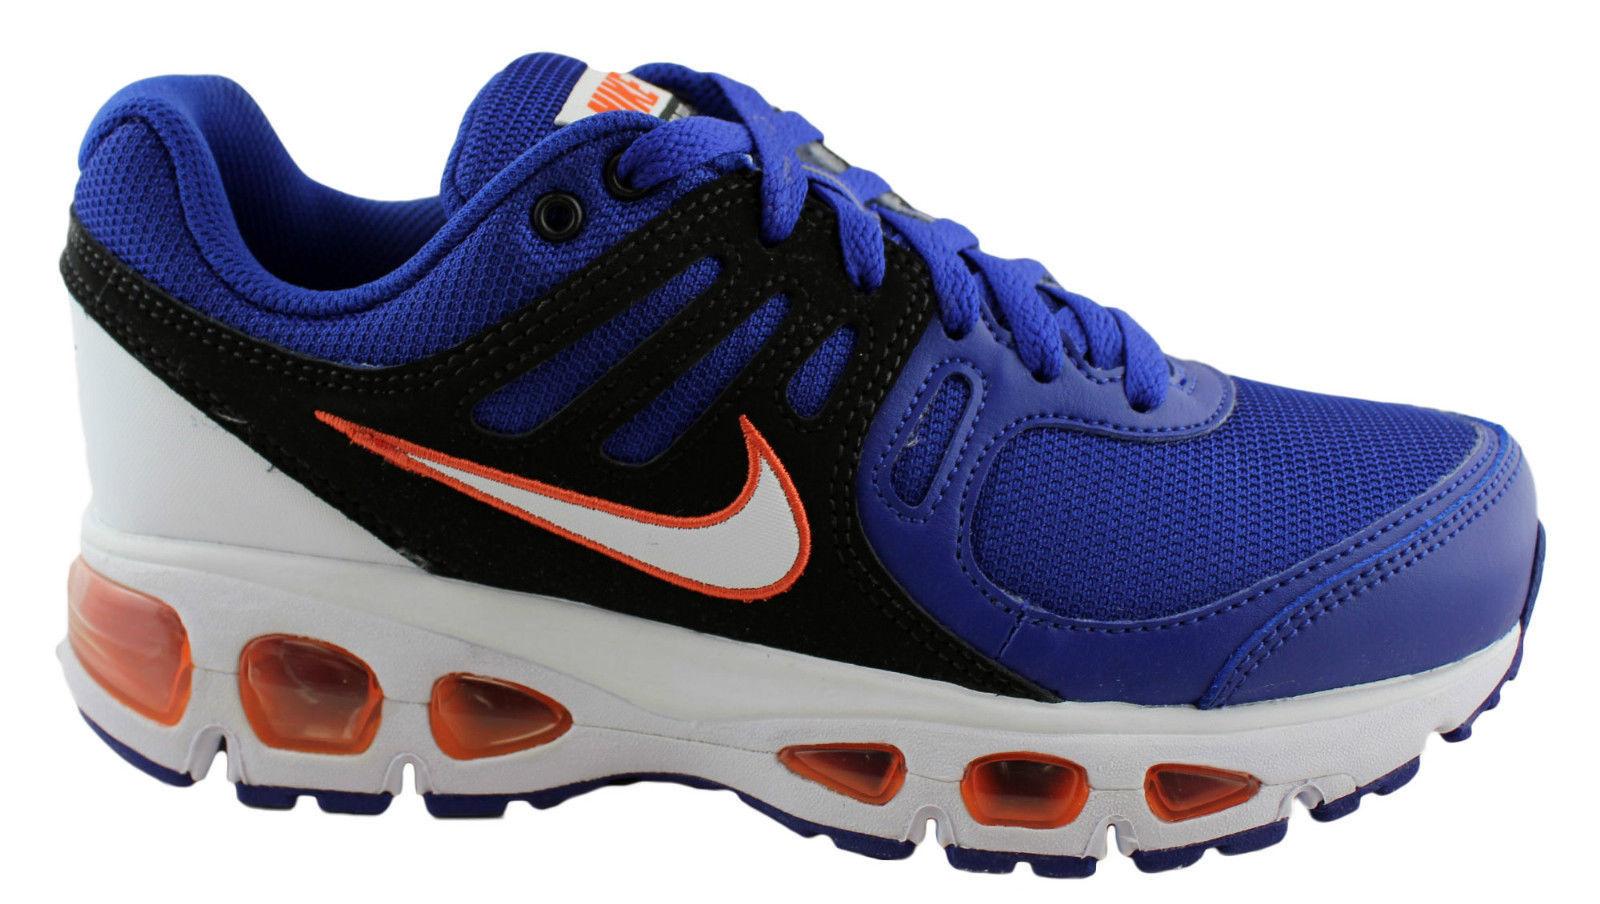 Nike Boys' Shoes for sale | eBay